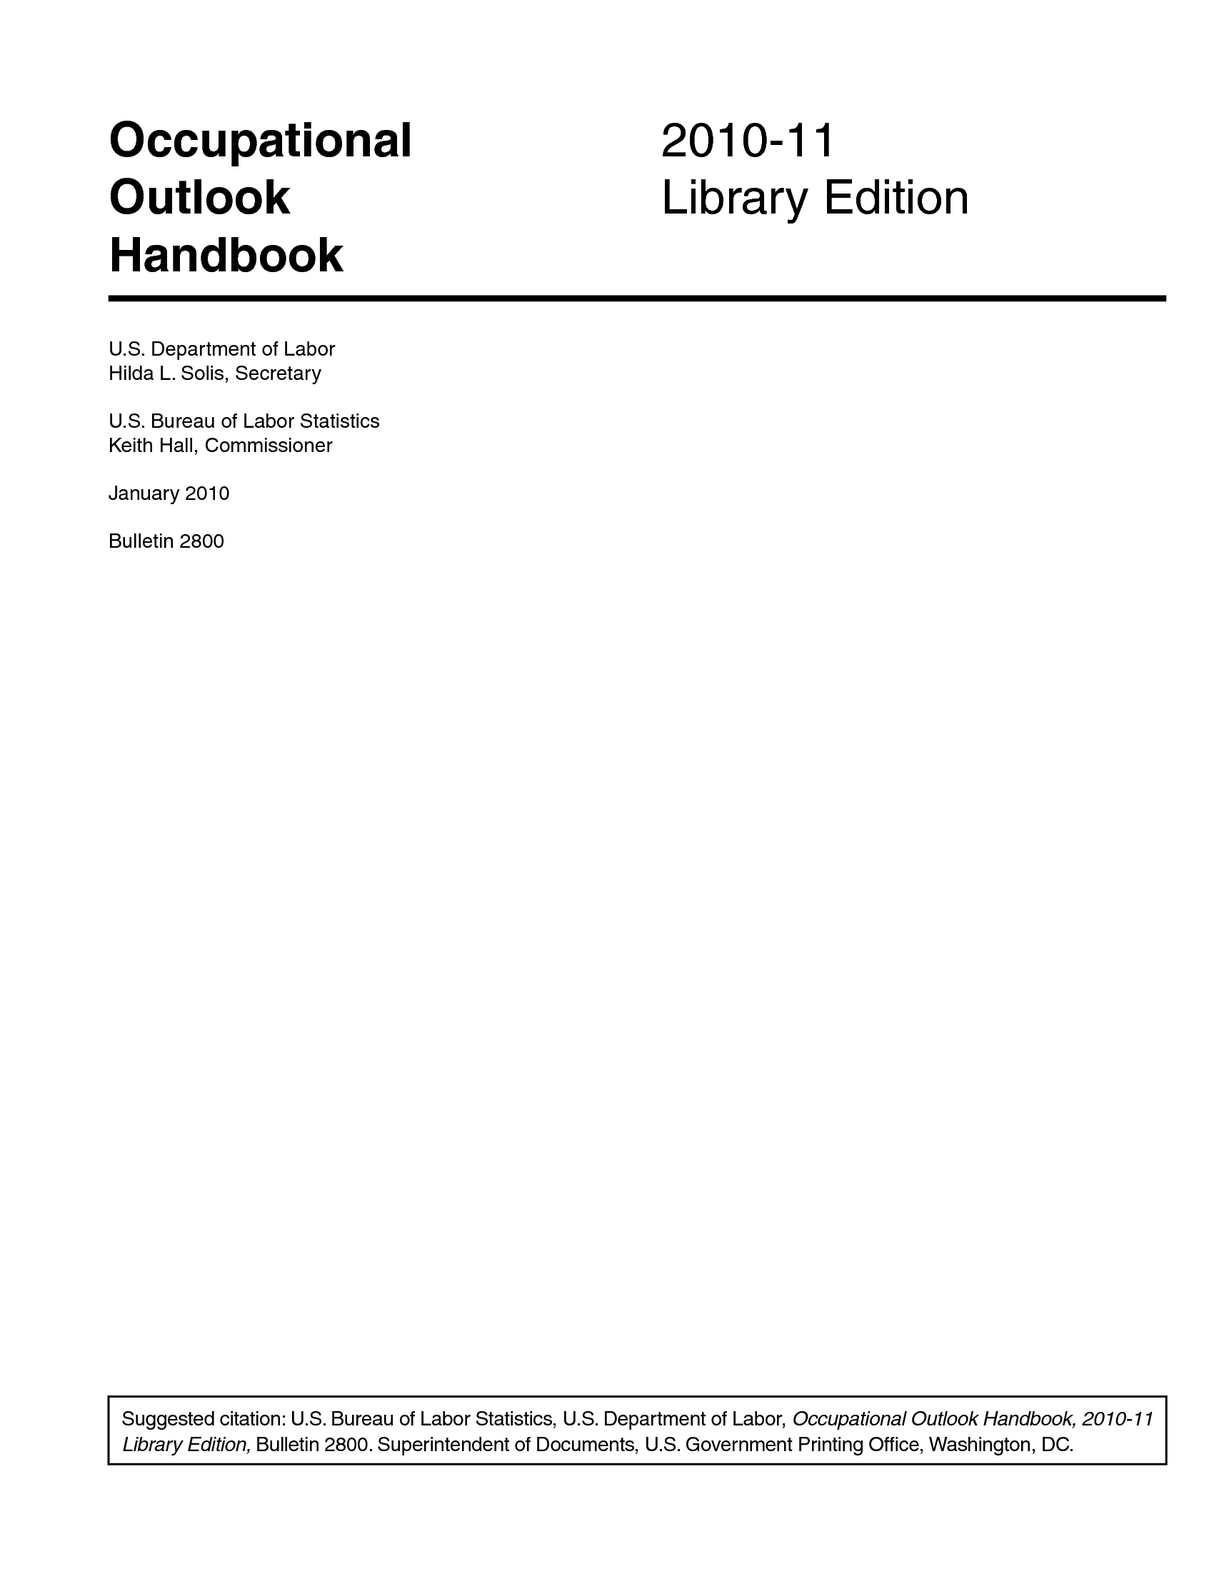 Calaméo - Occupational Outlook Handbook 2010-11 Liry Edition on